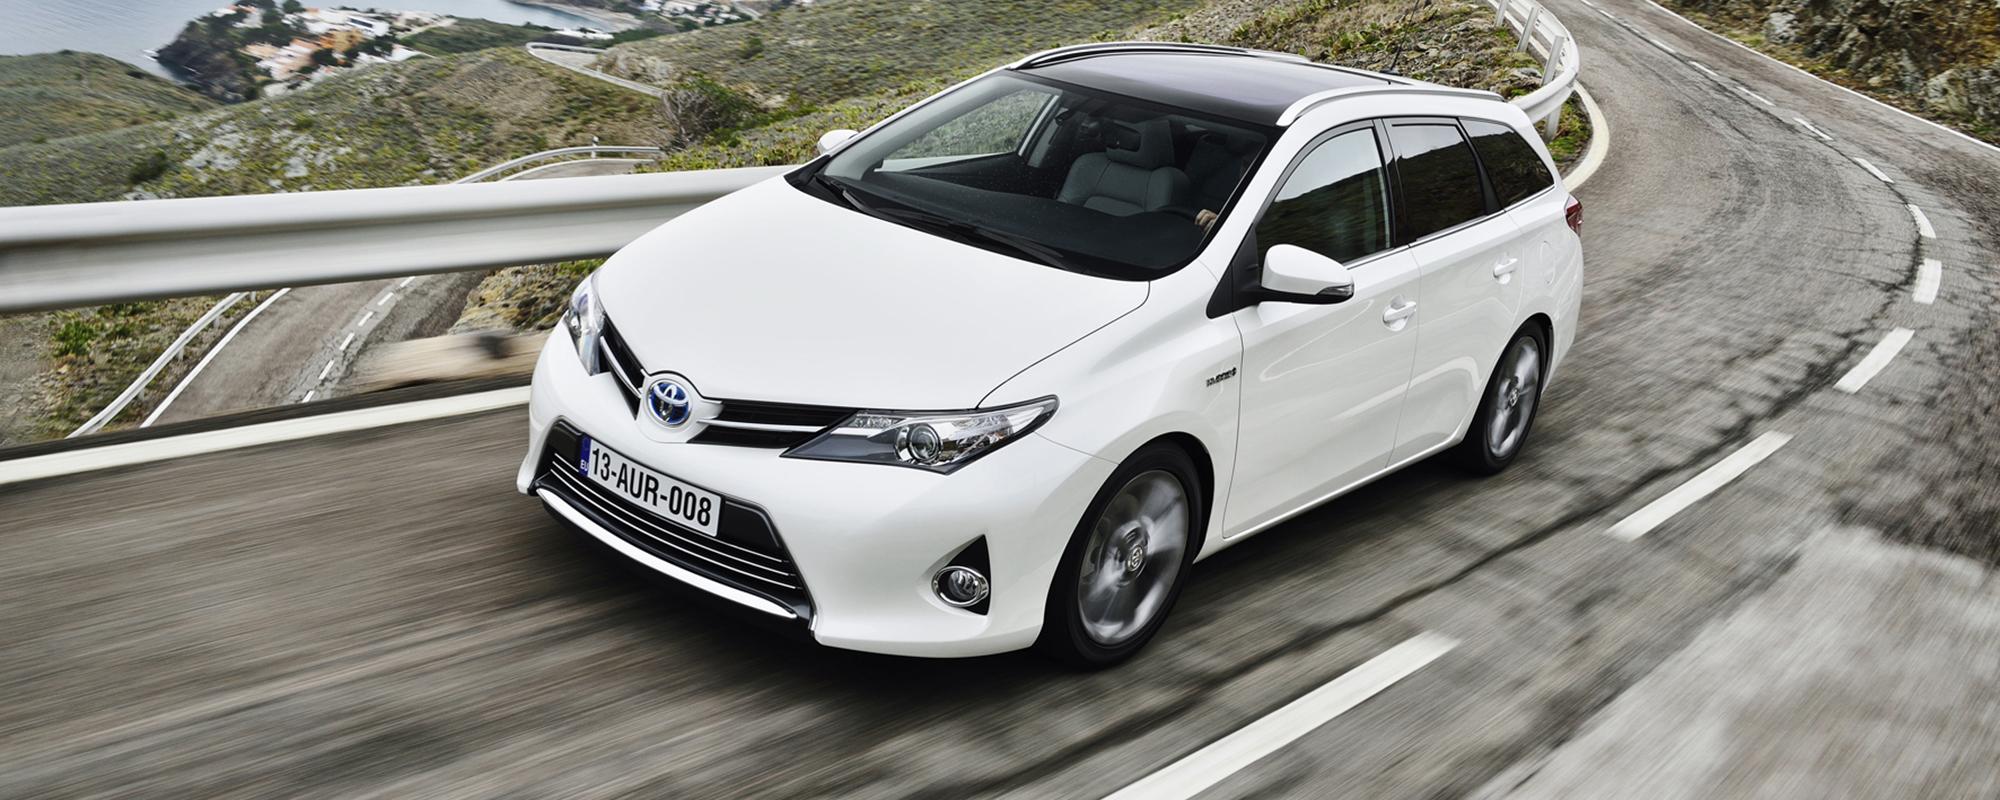 Eerste details Toyota Auris Touring Sports